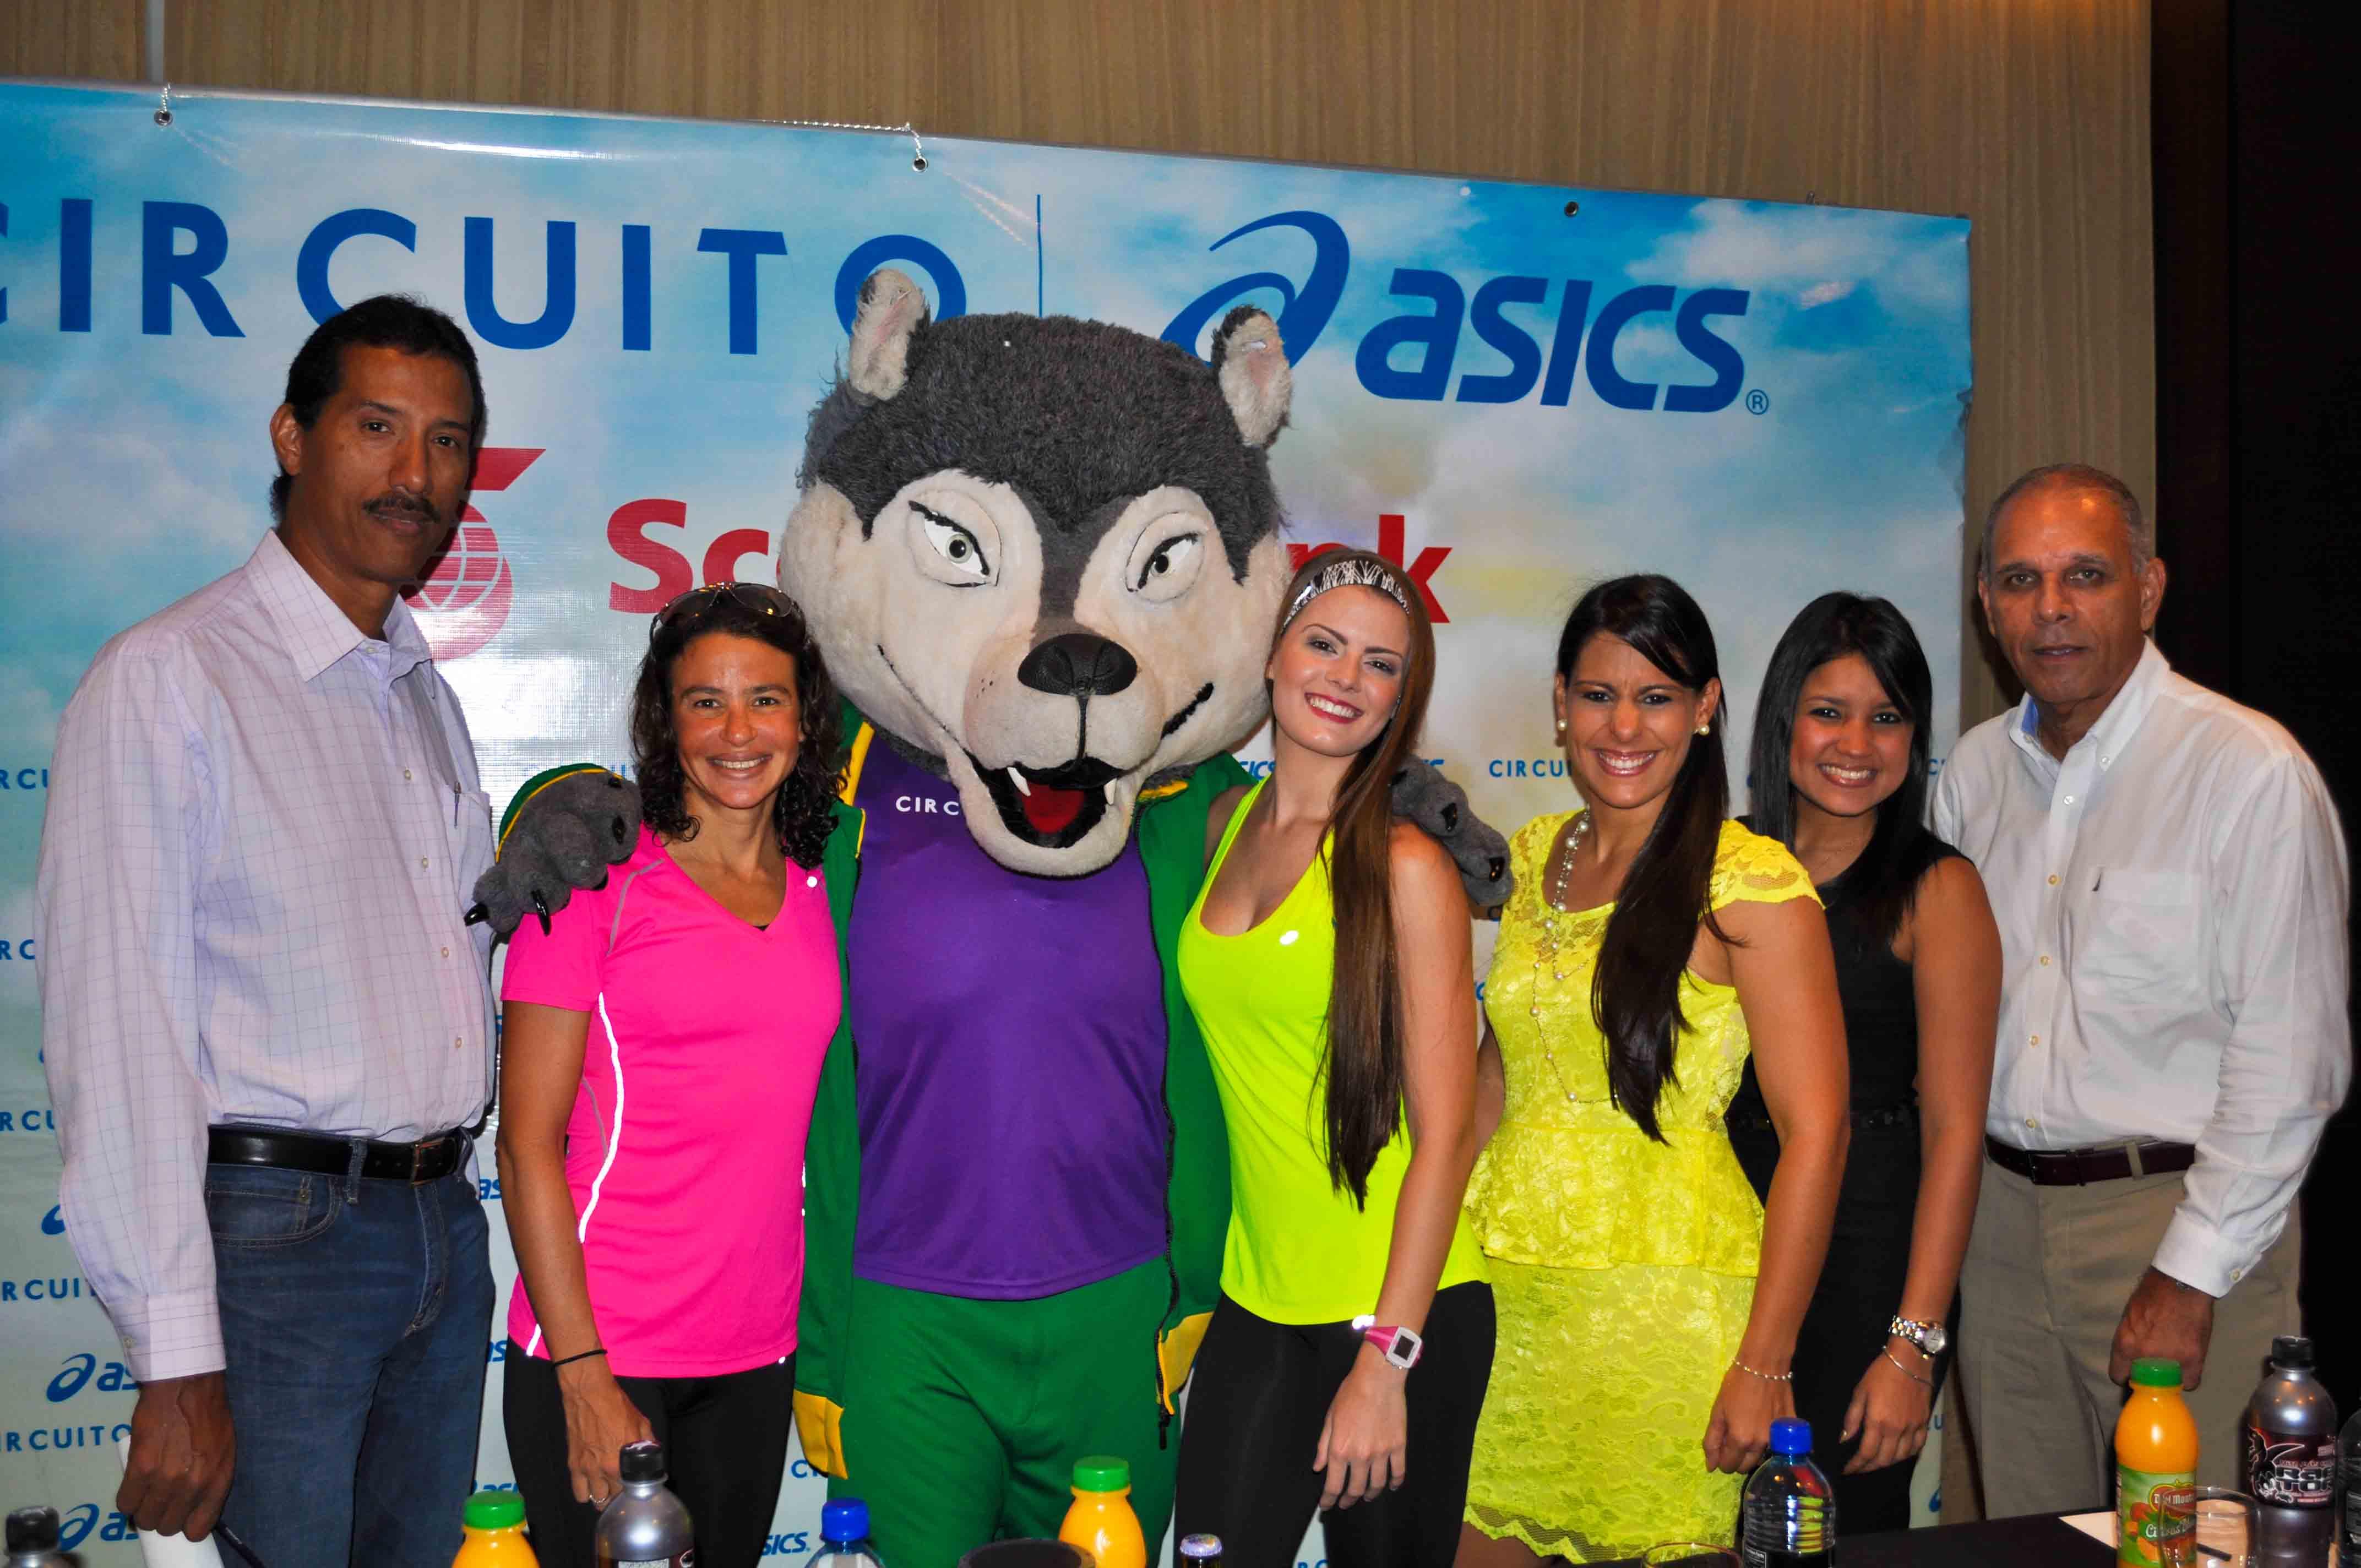 Conferencia de Prensa Circuito Asics City PTY